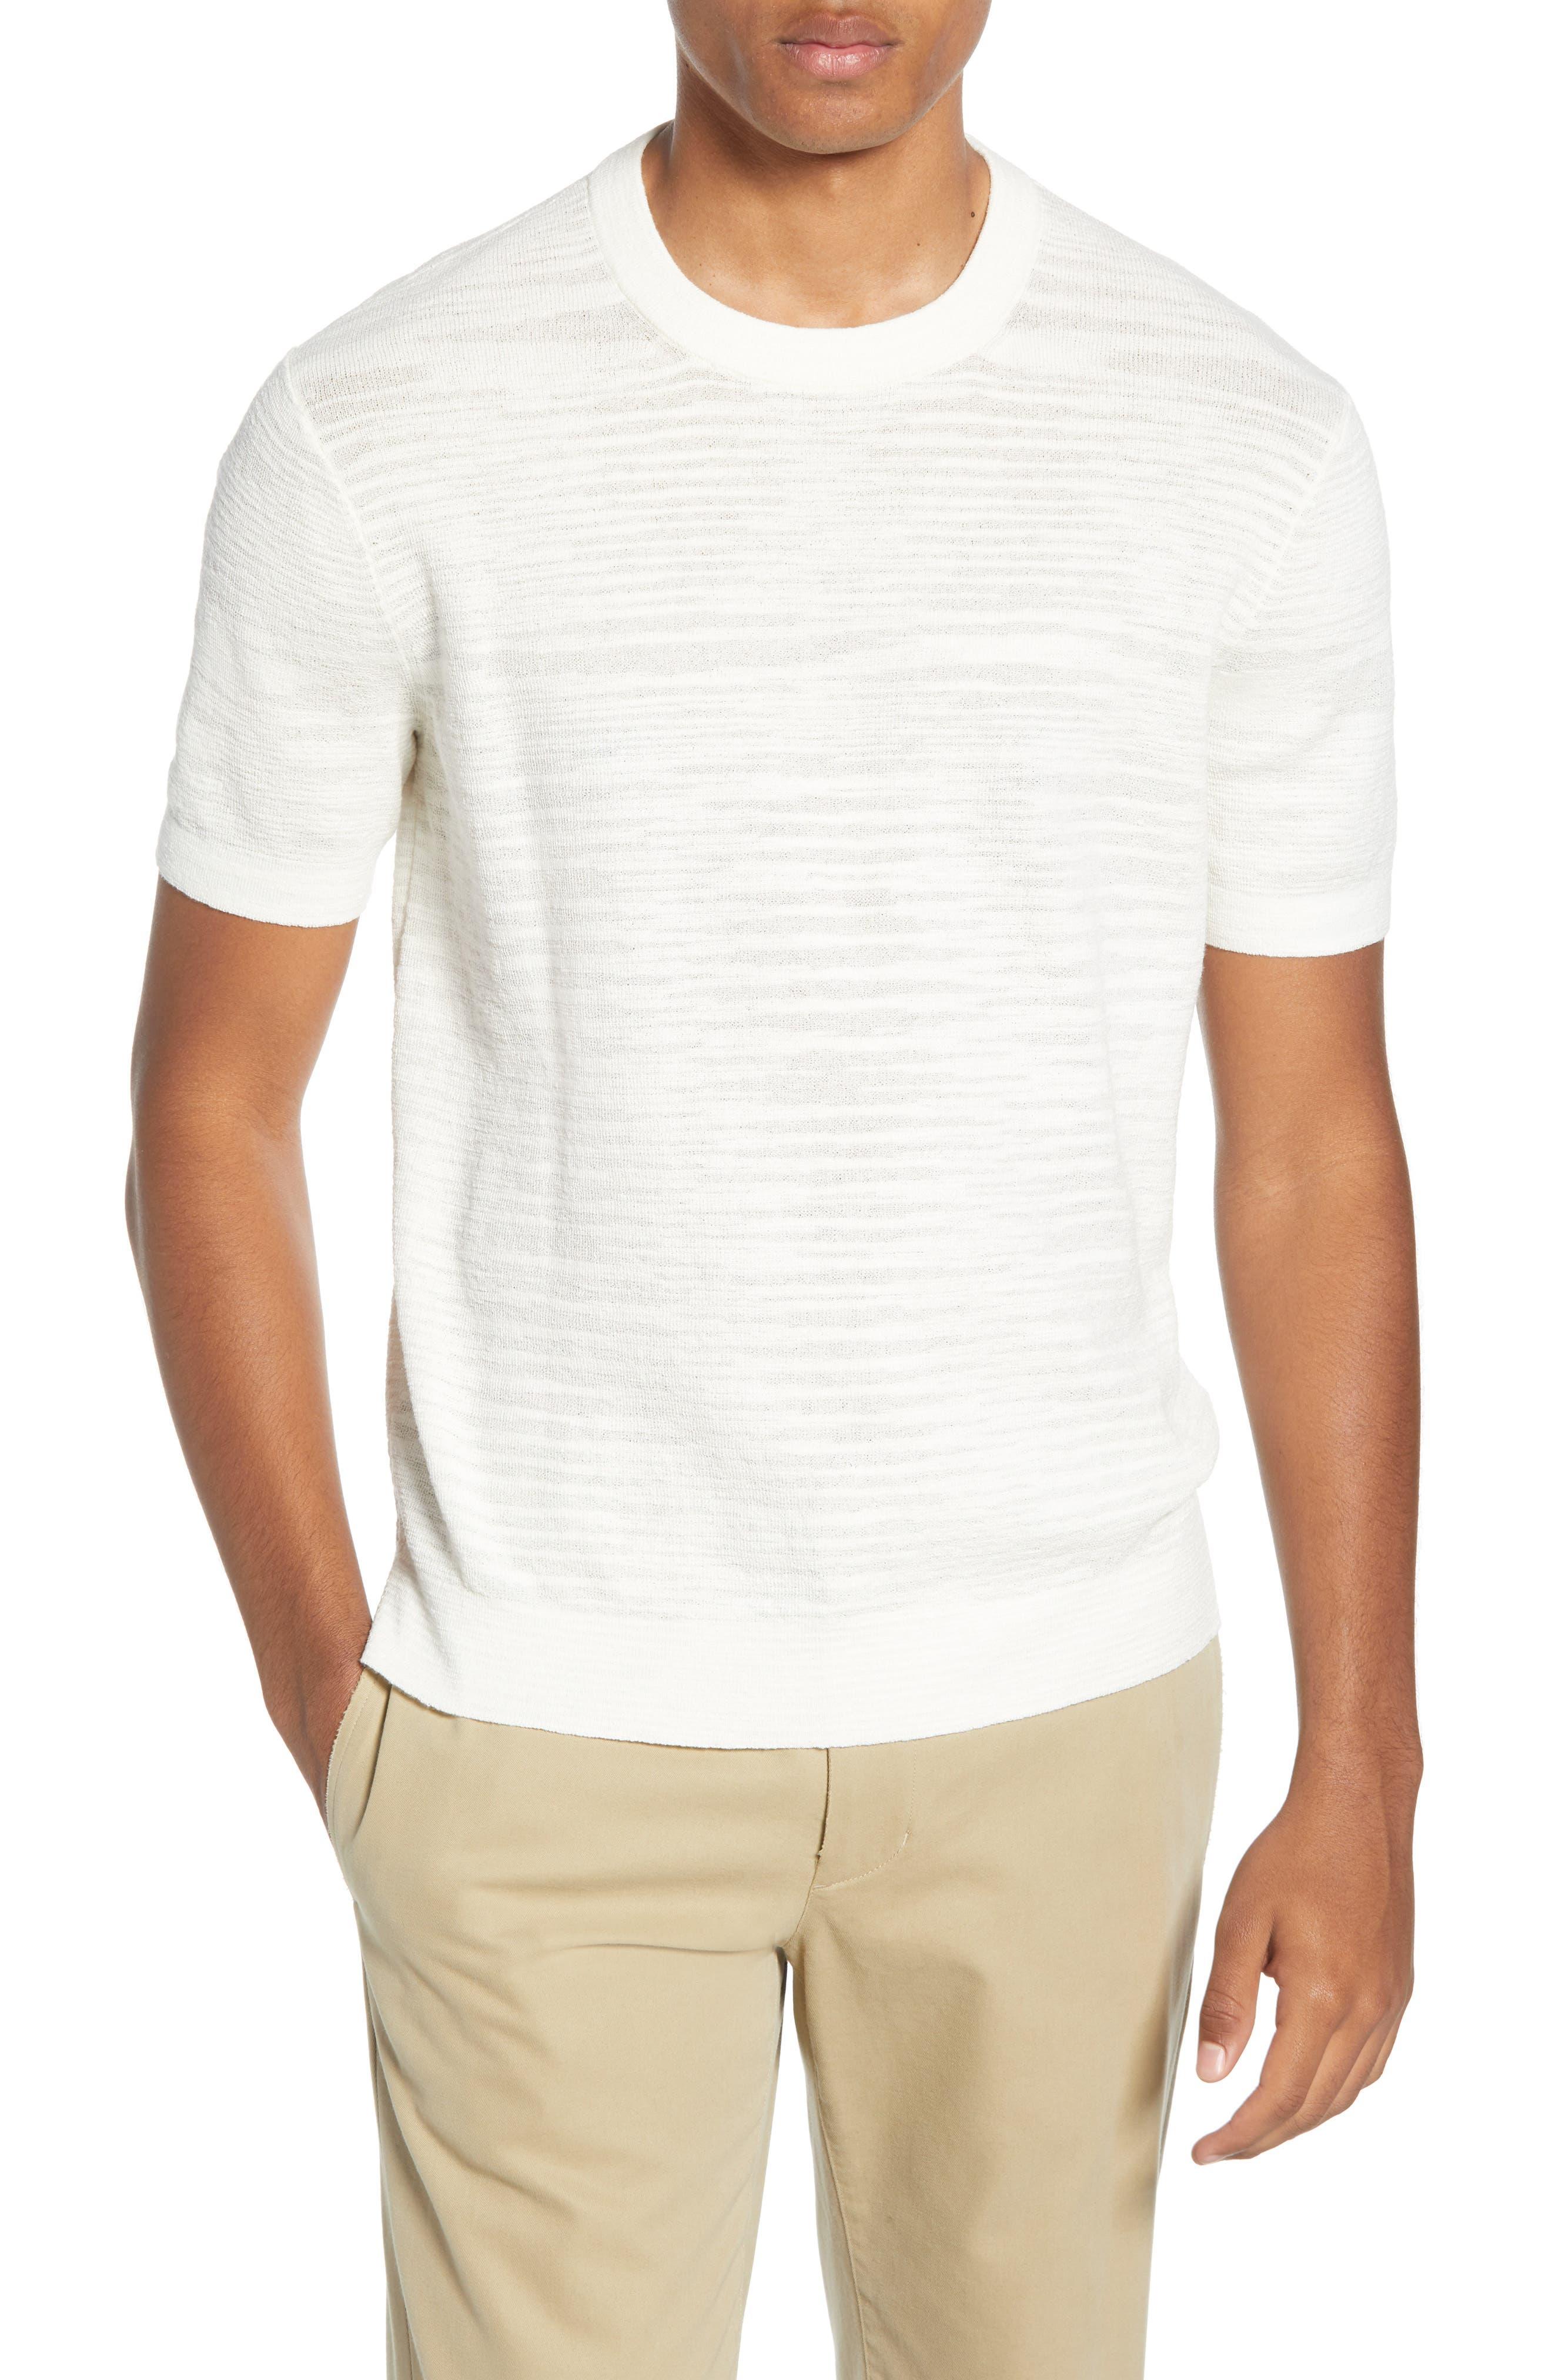 Club Monaco Short Sleeve Cotton Sweater, White